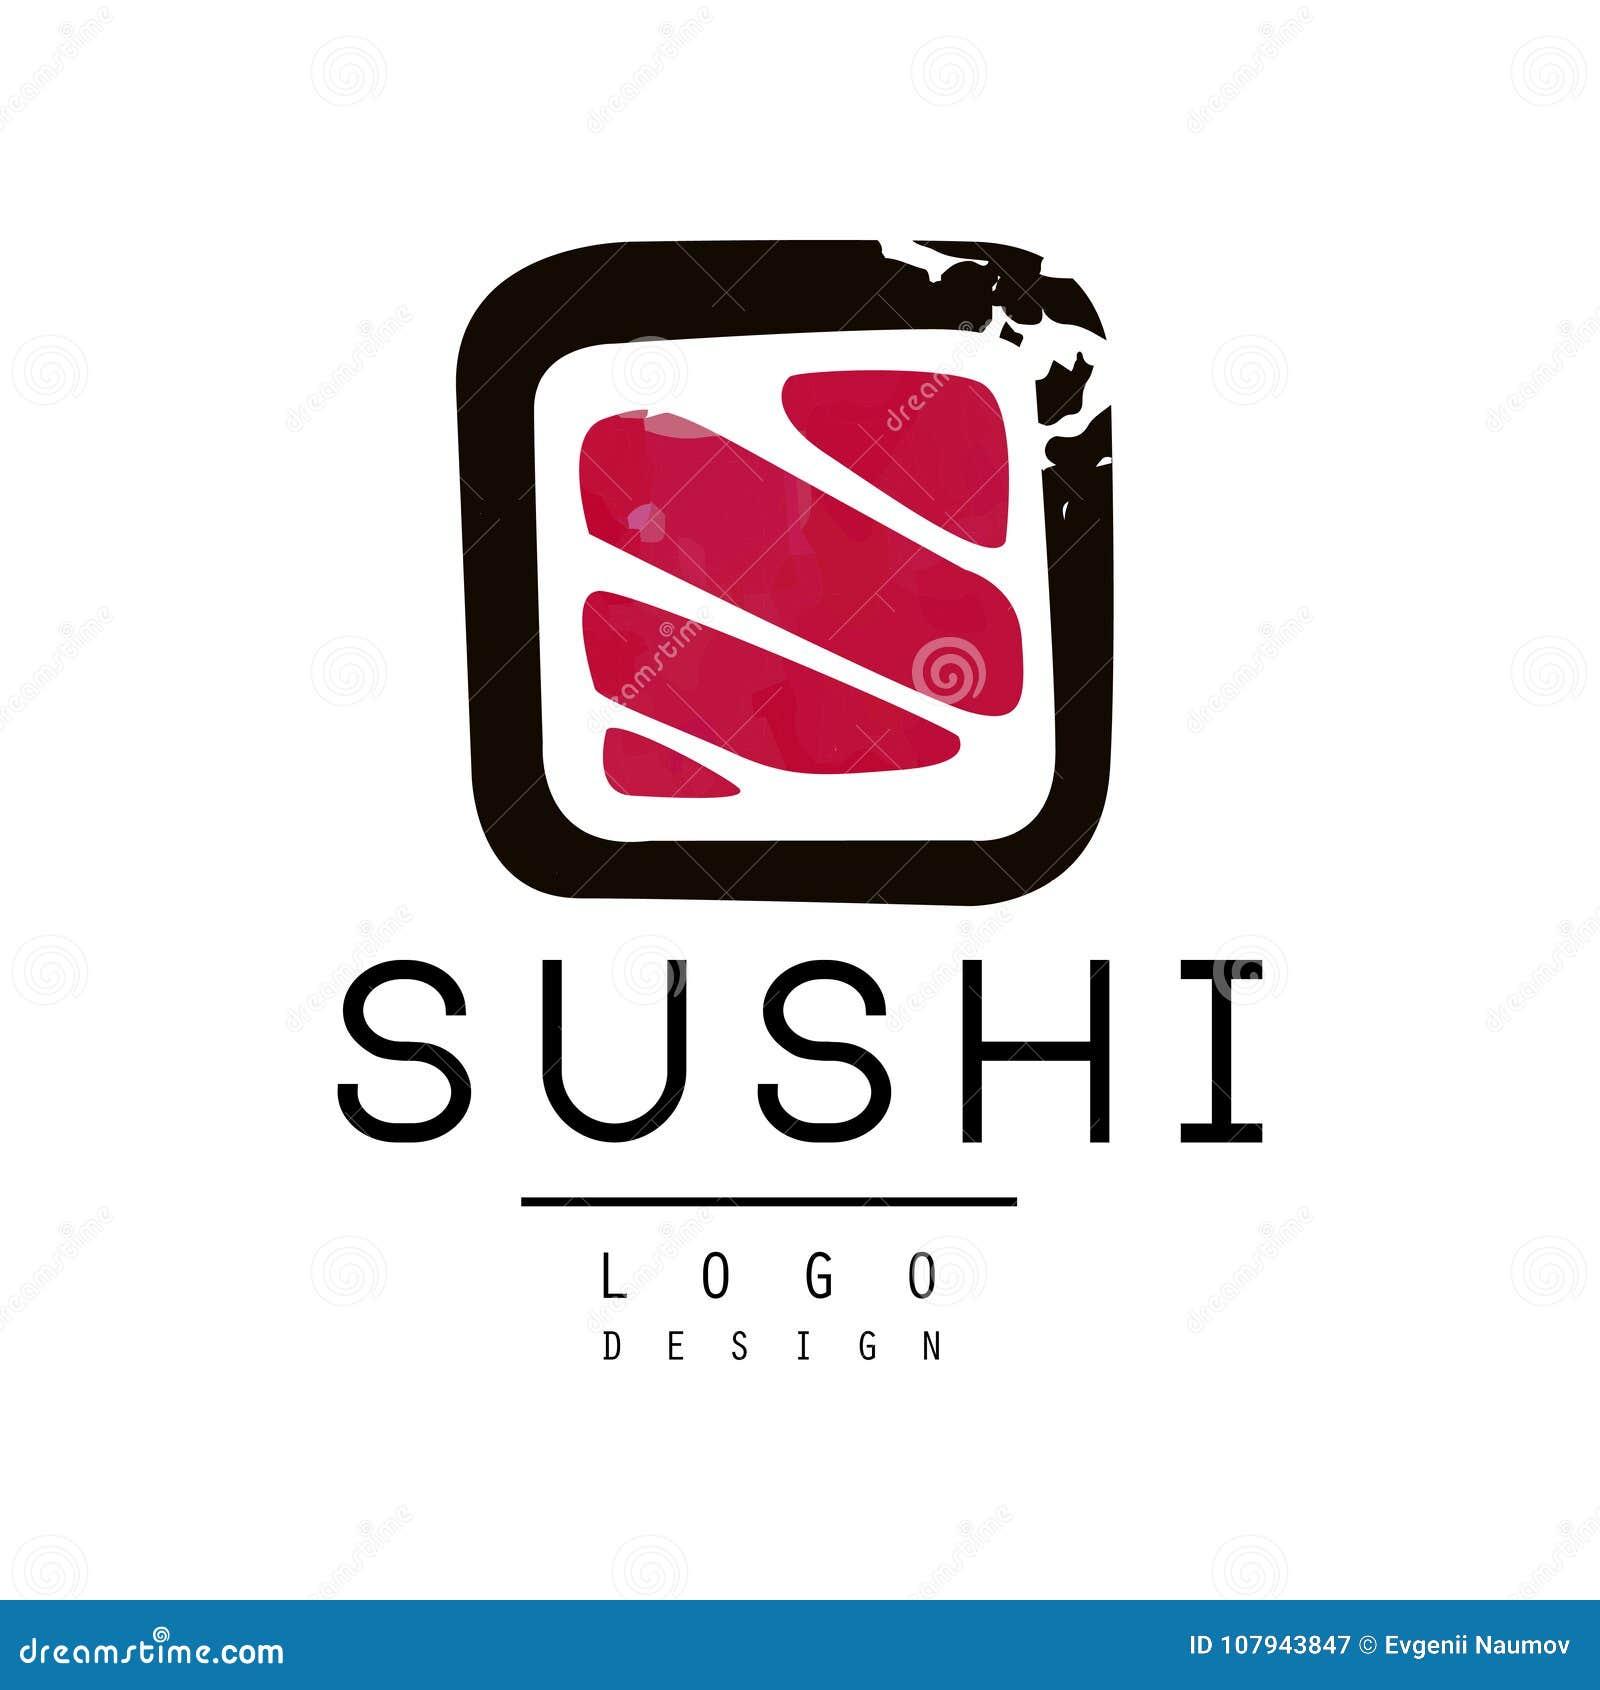 Sushi logo design, badge for sushi bar or seafood restaurant watercolor vector Illustration